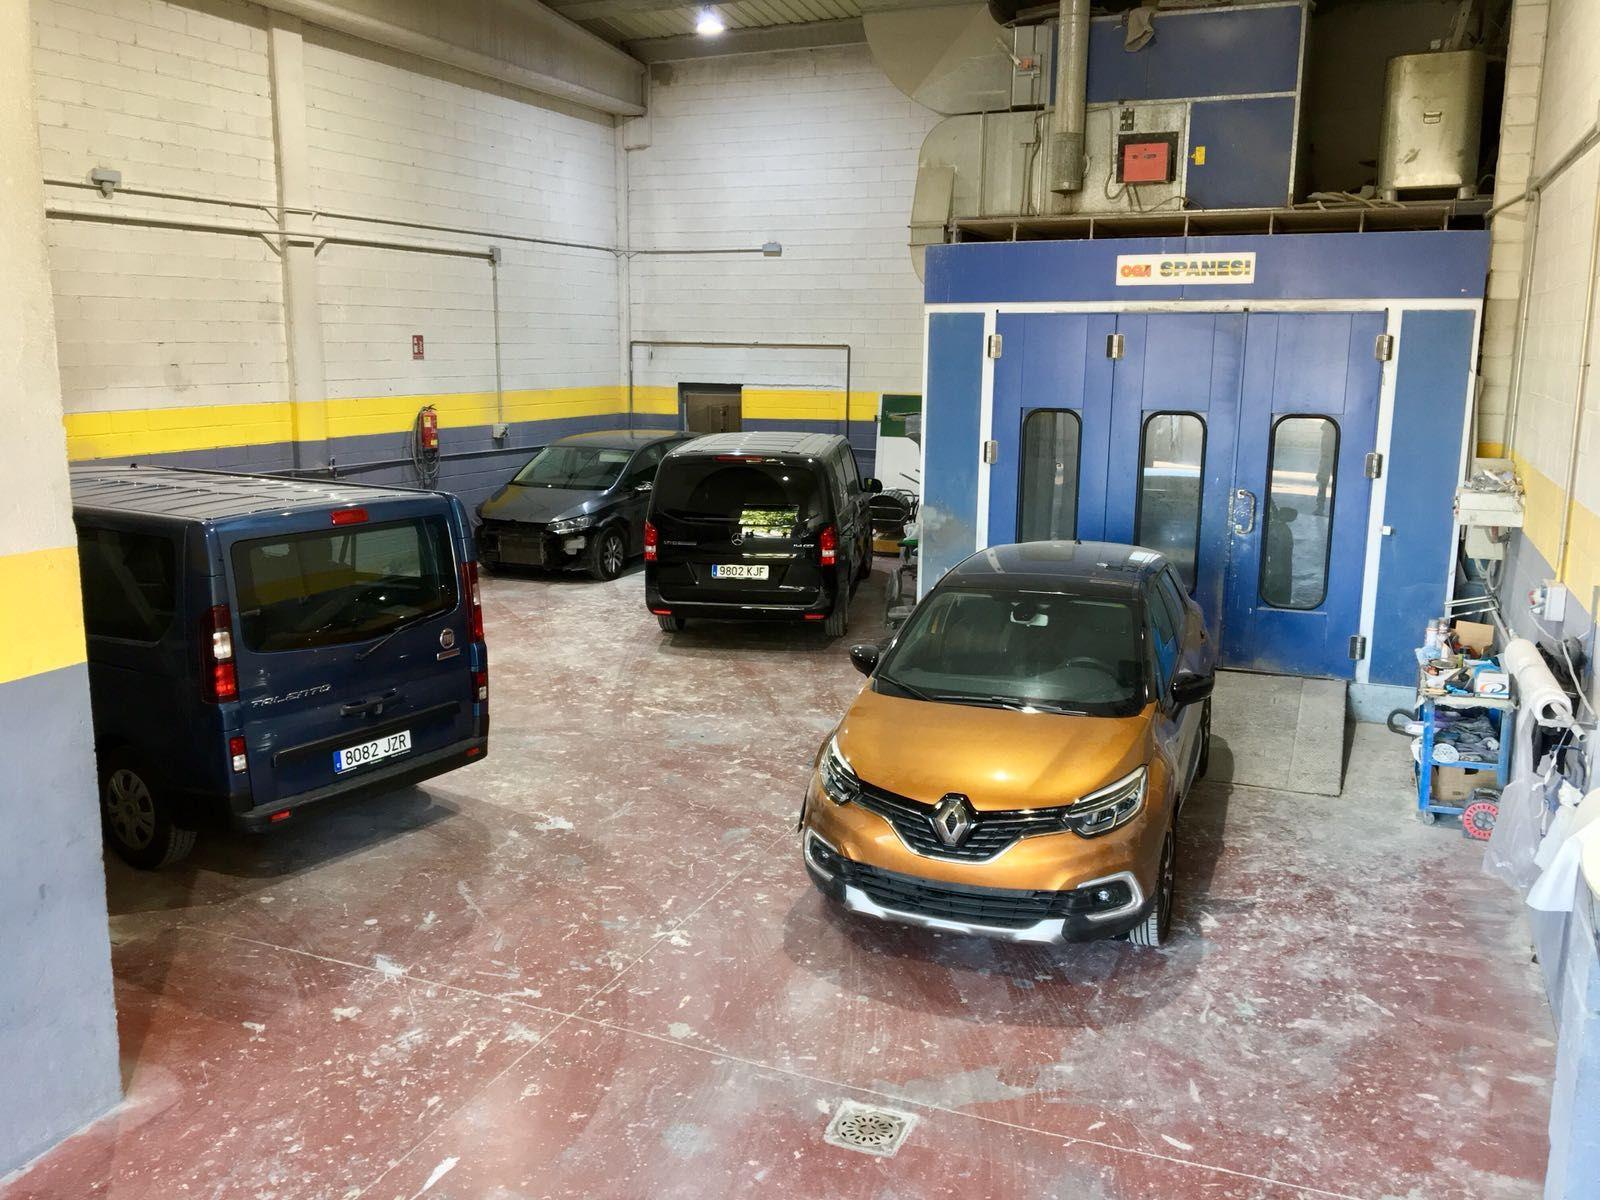 Talleres de reparación de coches en Alcalá de Henares